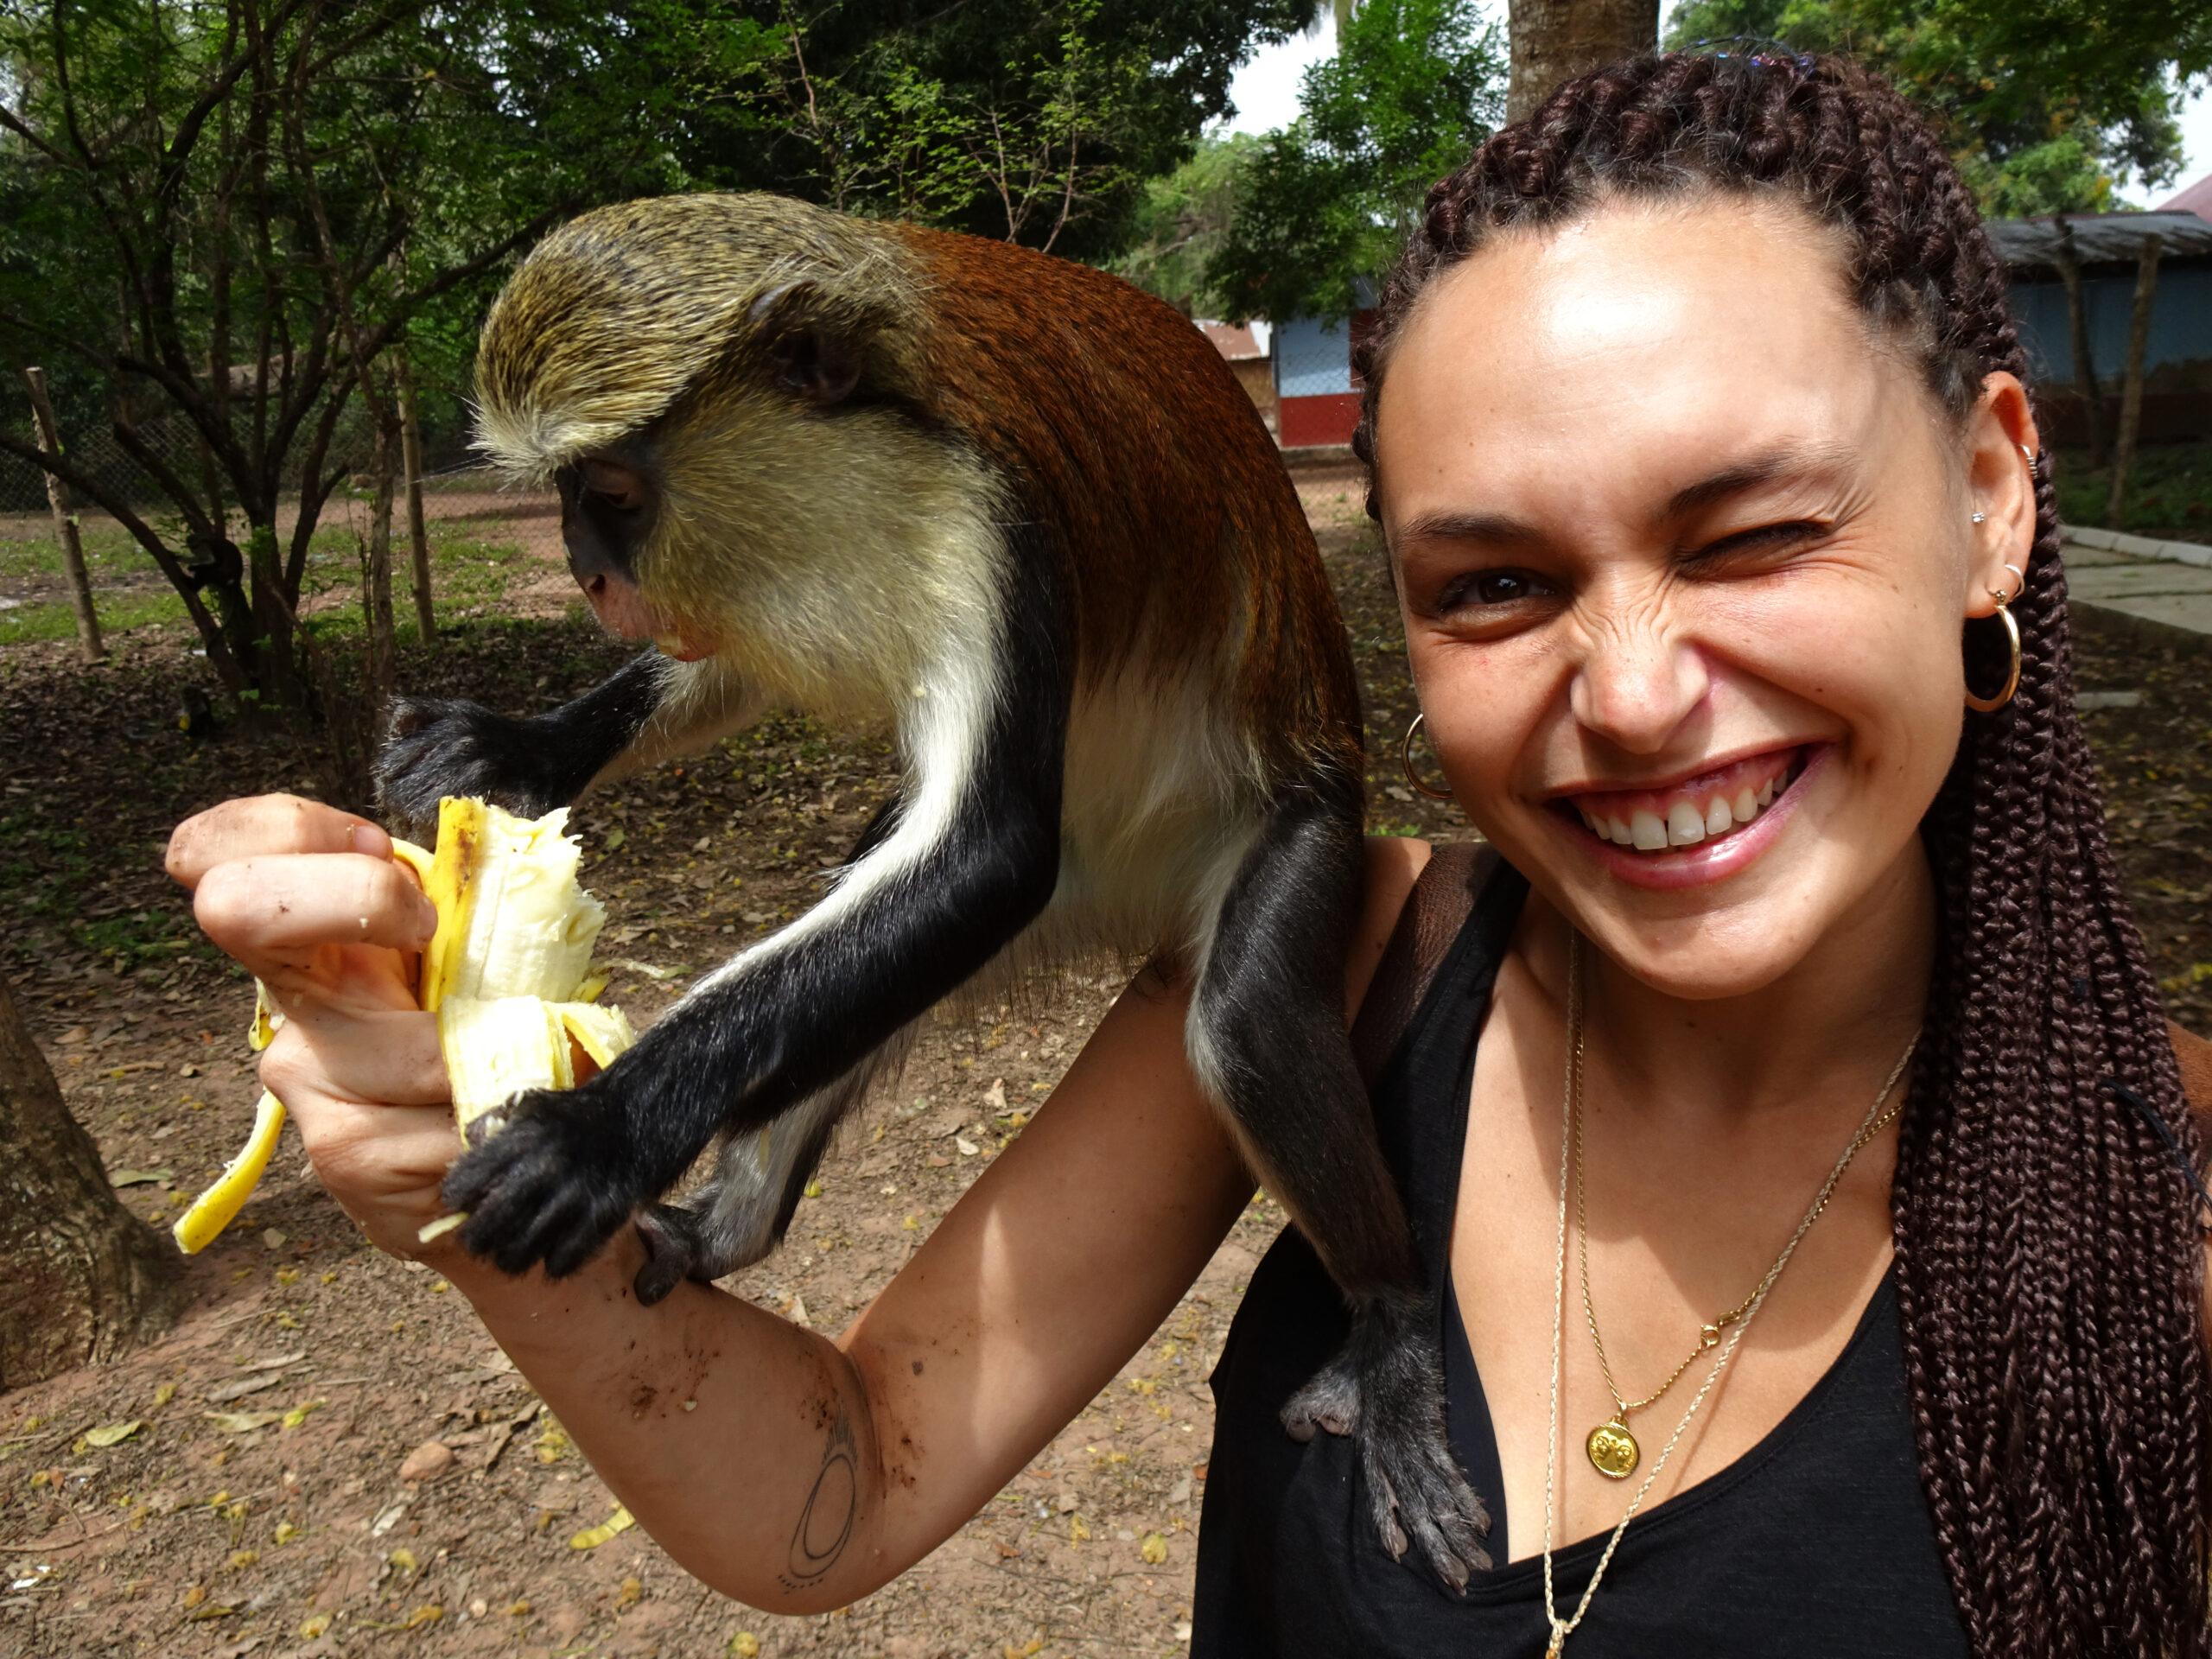 Selfie with Mona Monkey eating banana at the Tafi Atome Sanctuary